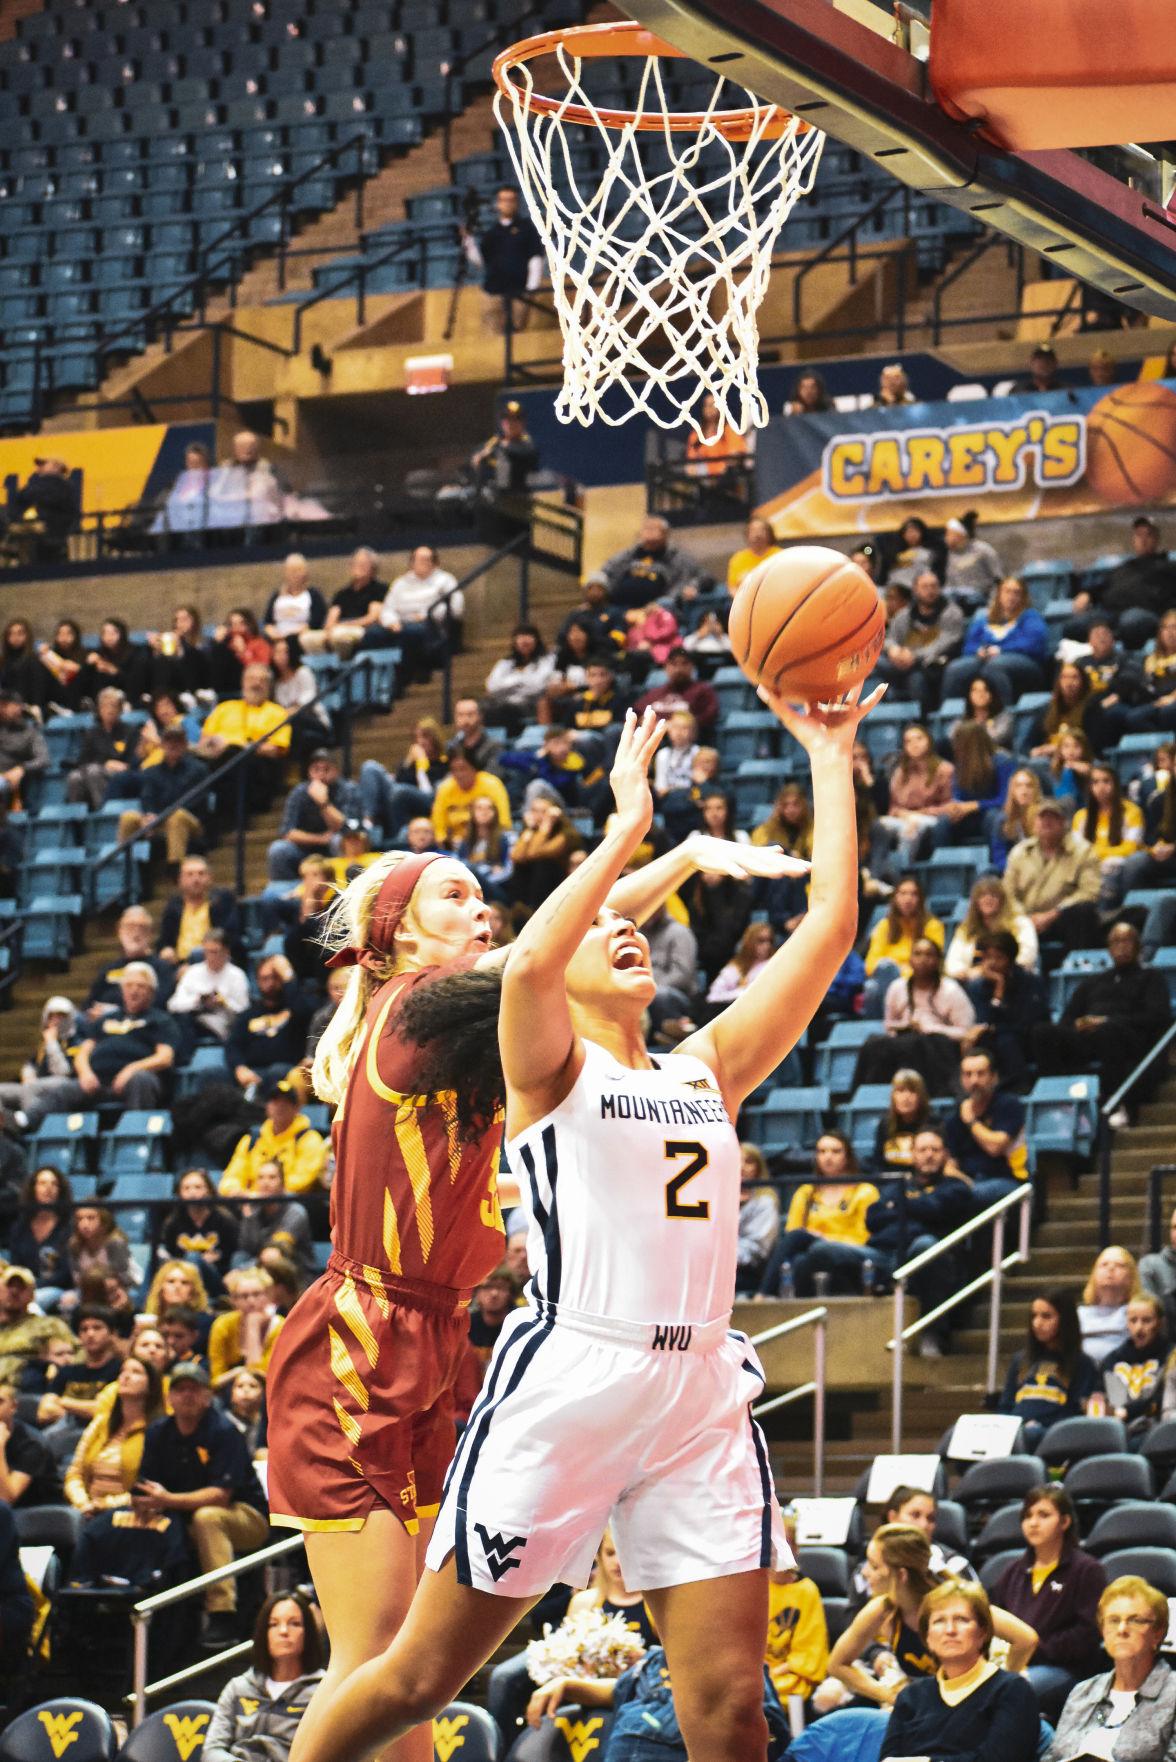 Feb. 2nd 2020 - Redshirt Junior Kyrse Gondrezick puts up a tough shot against Iowa State at the Coliseum